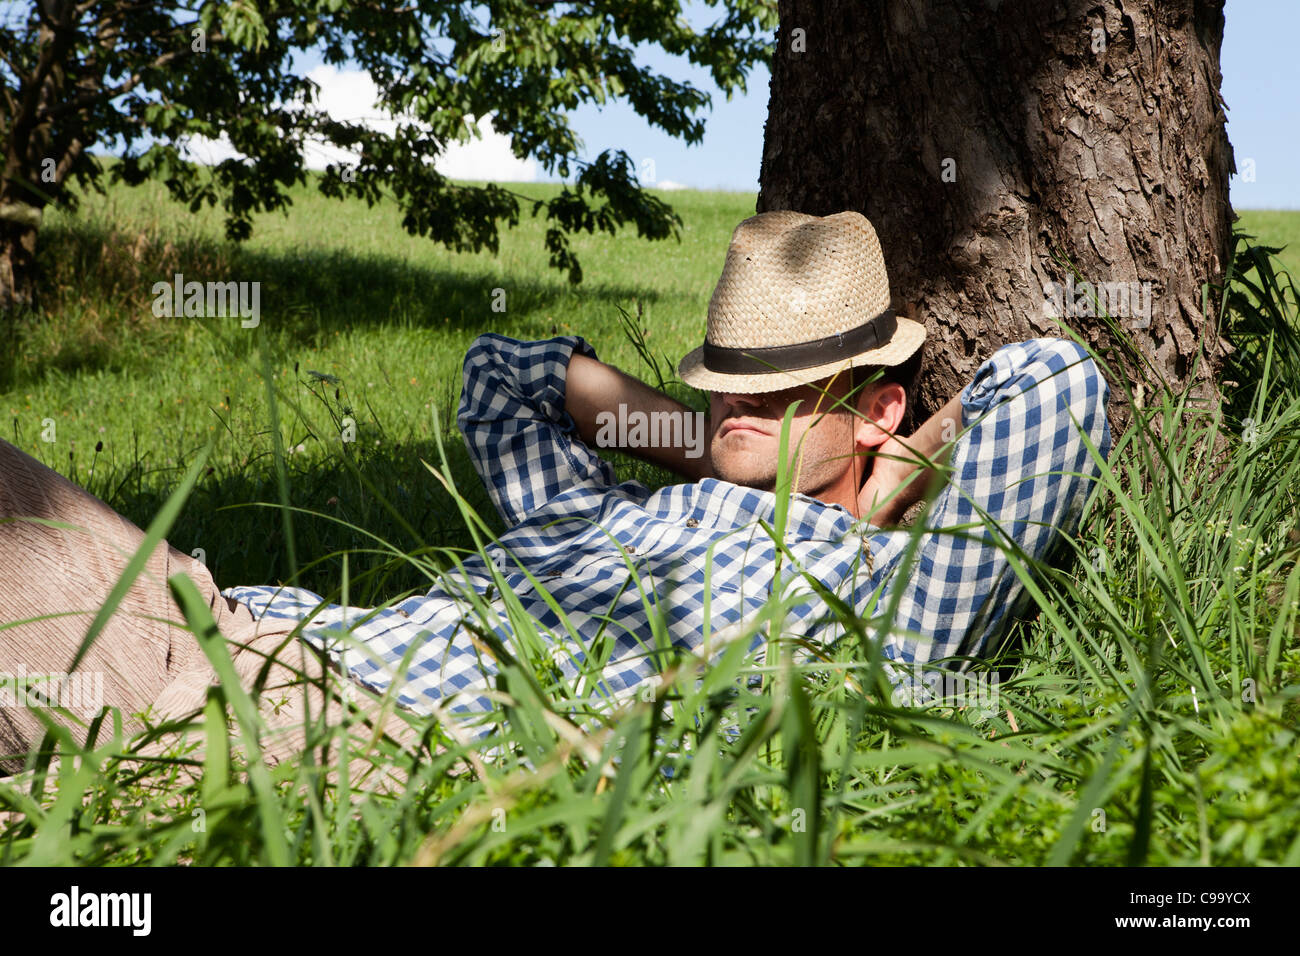 Germany, Bavaria, Altenthann, Man resting under tree - Stock Image